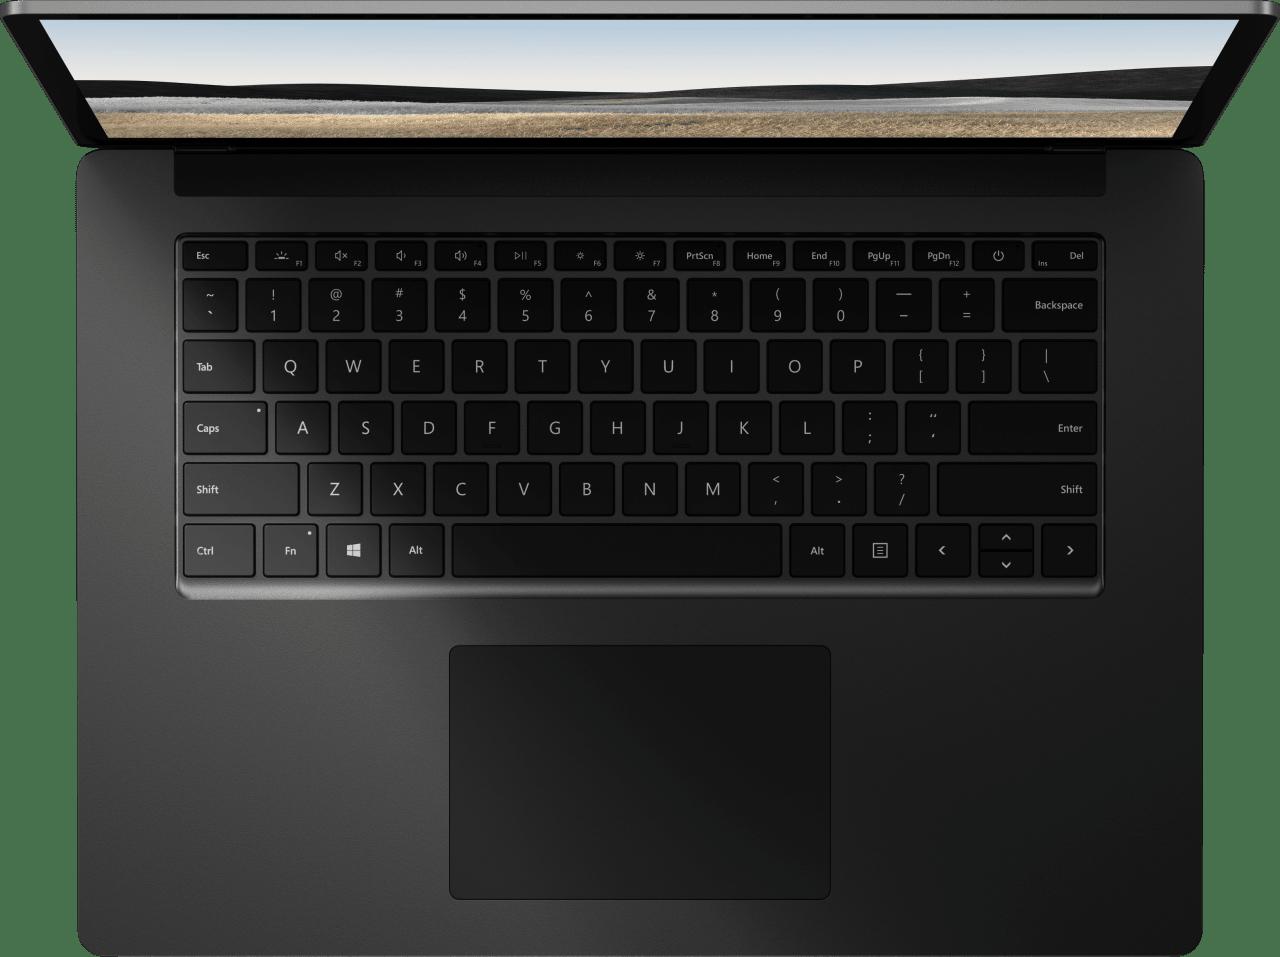 Schwarz (Metall) Microsoft Surface Laptop 4 Notebook - AMD Ryzen™ 7 4980U - 16GB - 512GB SSD - AMD Radeon™ Vega RX 11.3